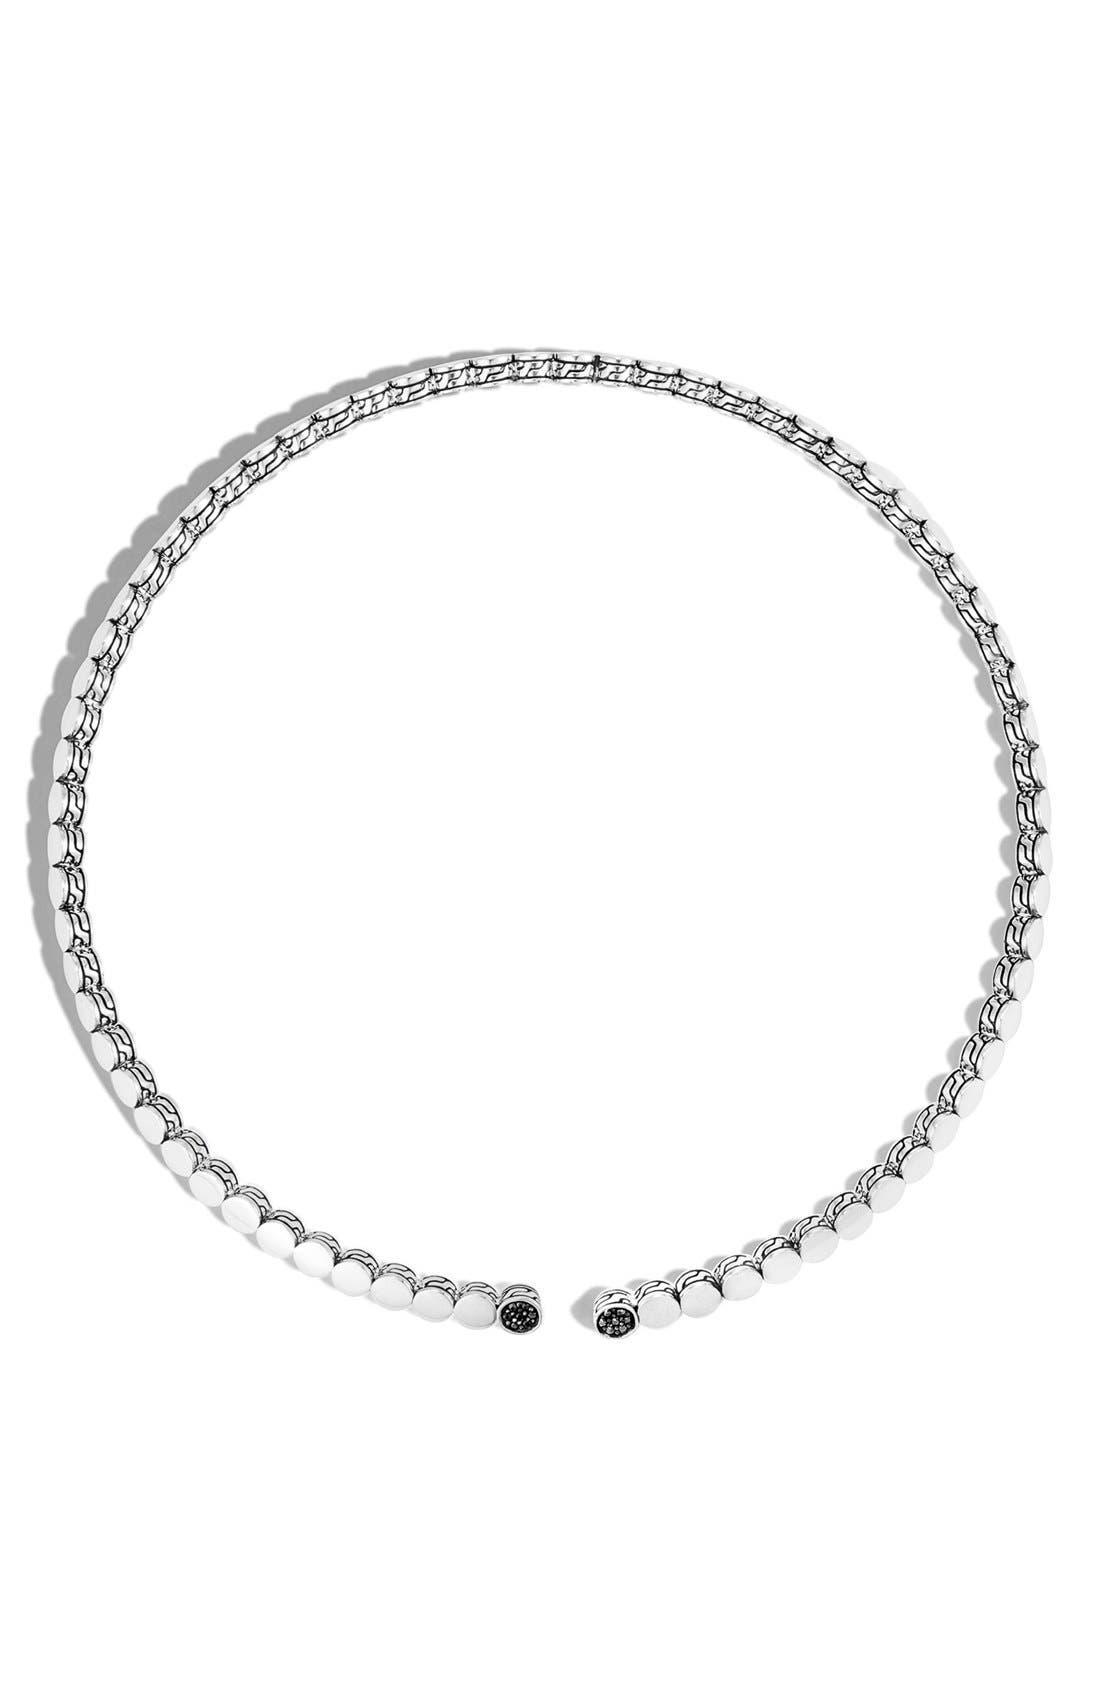 Main Image - John Hardy 'Dot' Silver Necklace